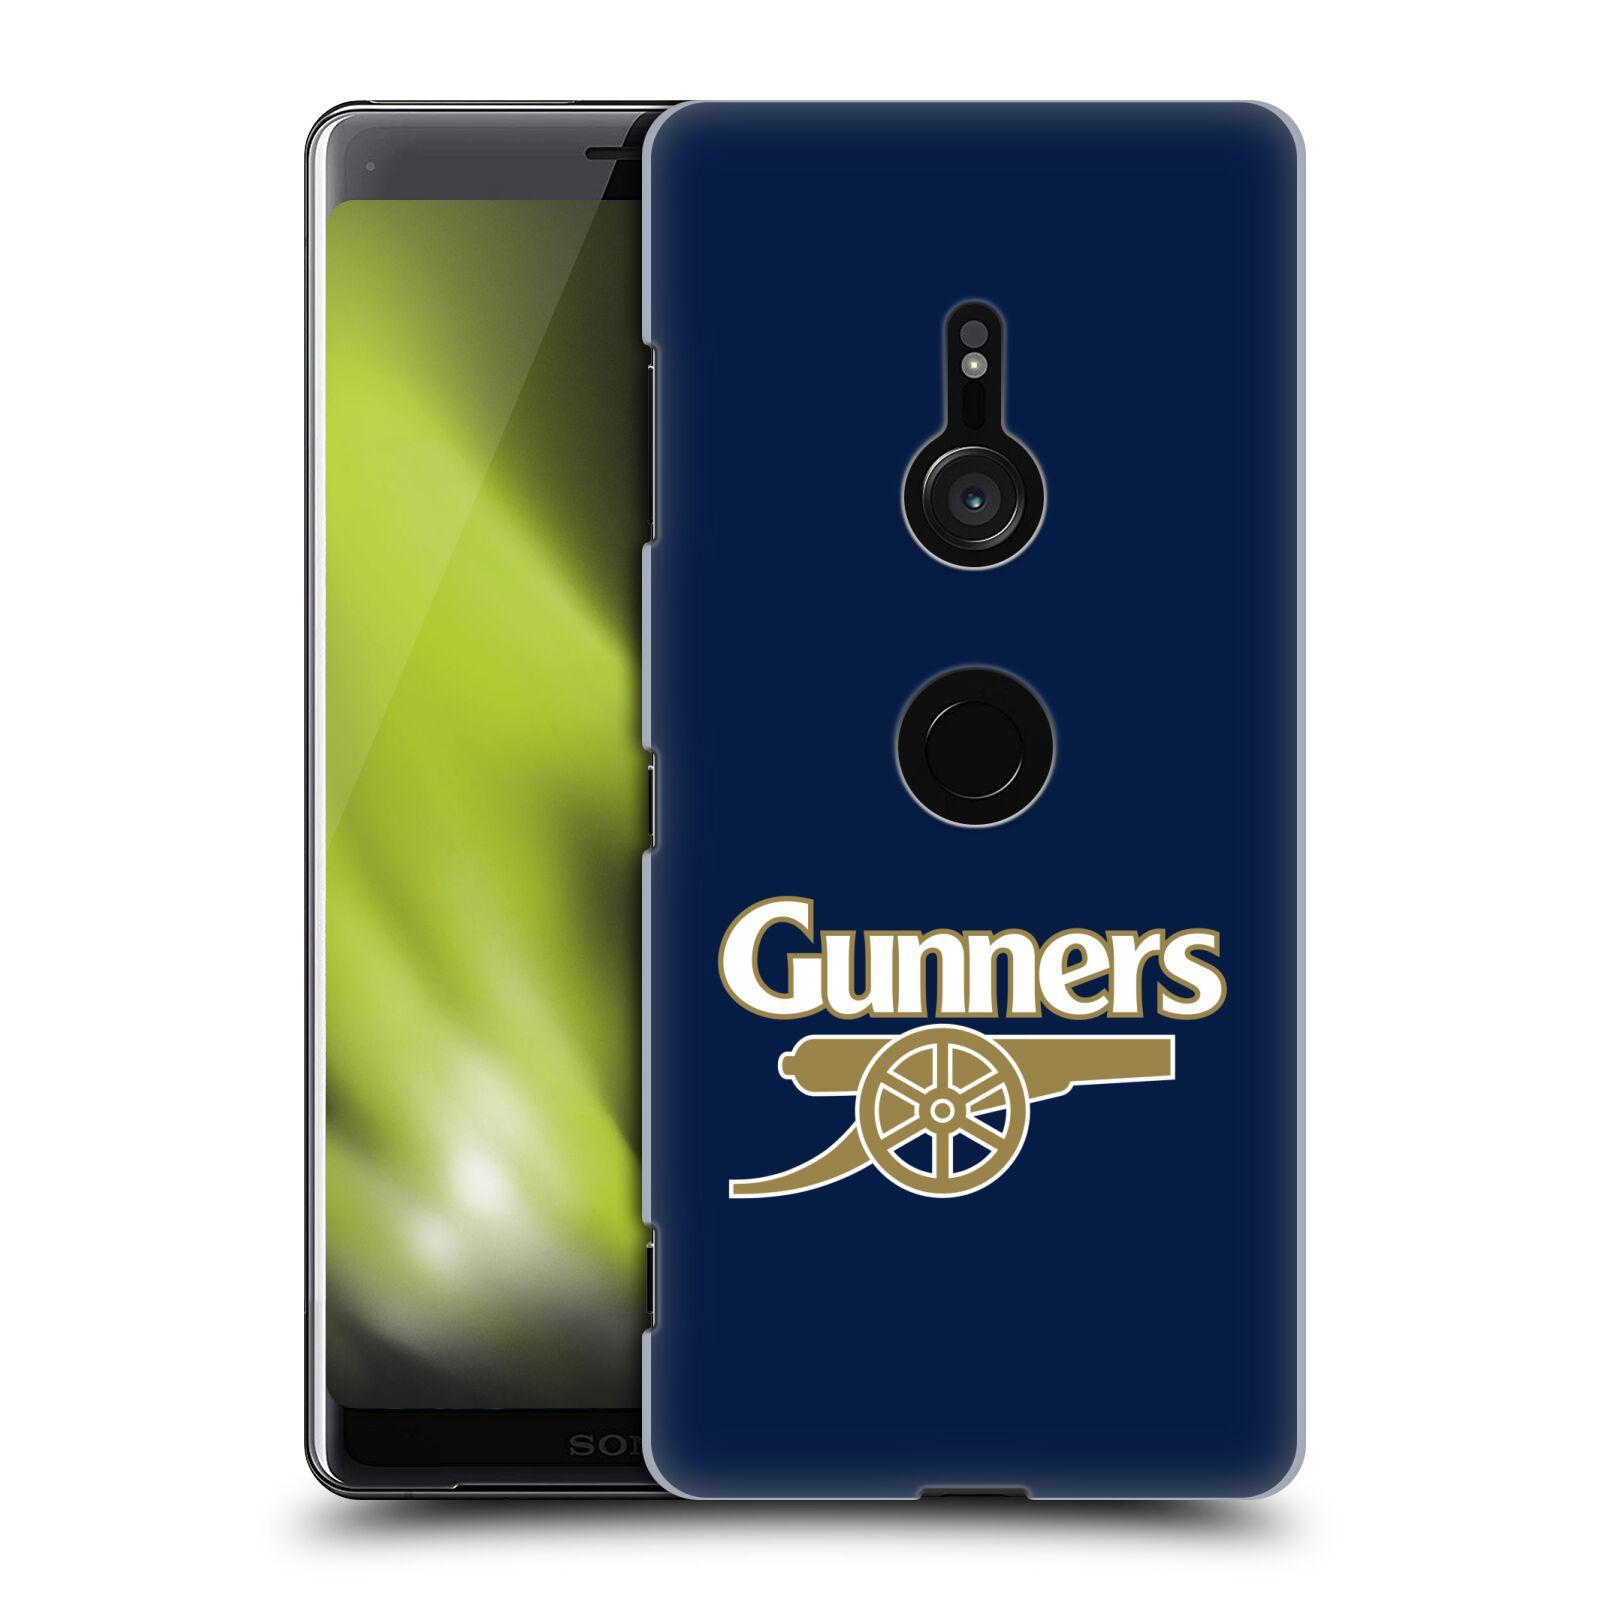 Plastové pouzdro na mobil Sony Xperia XZ3 - Head Case - Arsenal FC - Gunners